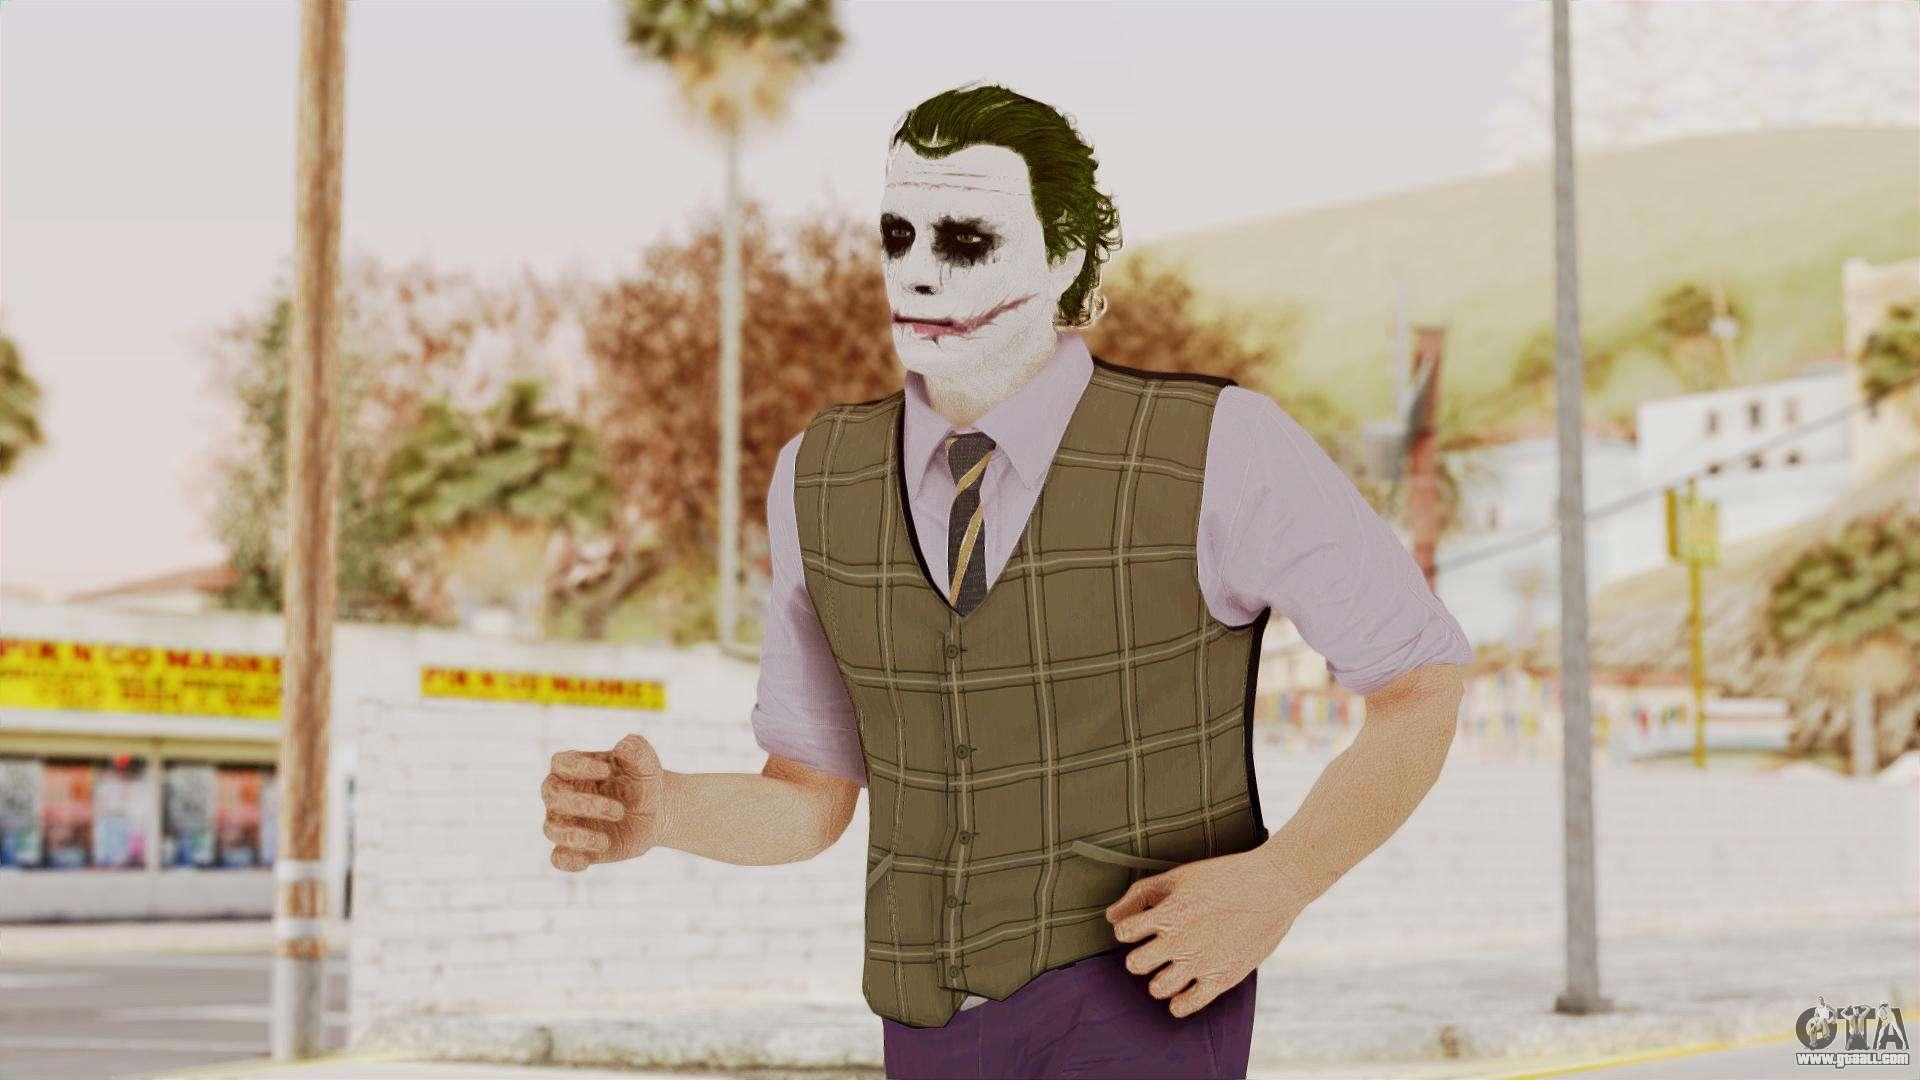 Joker Skin for GTA San Andreas